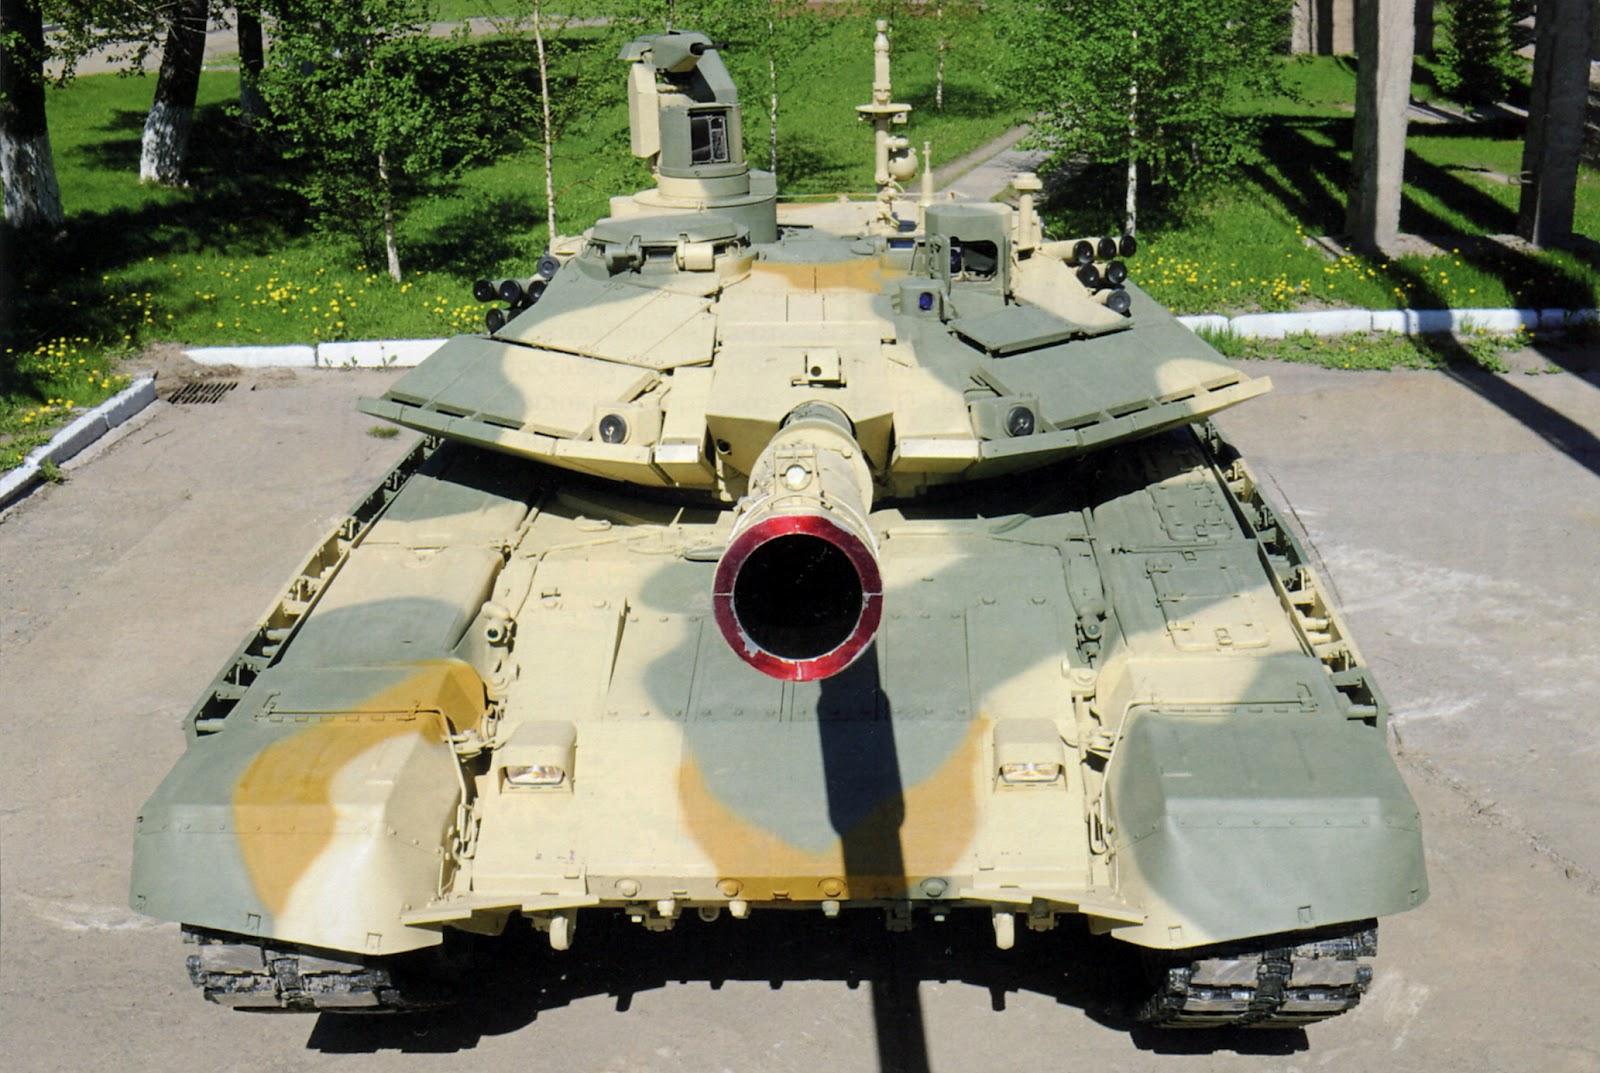 Vídeo: Belas imagens do MBT Uralvagonzavod T-90MS